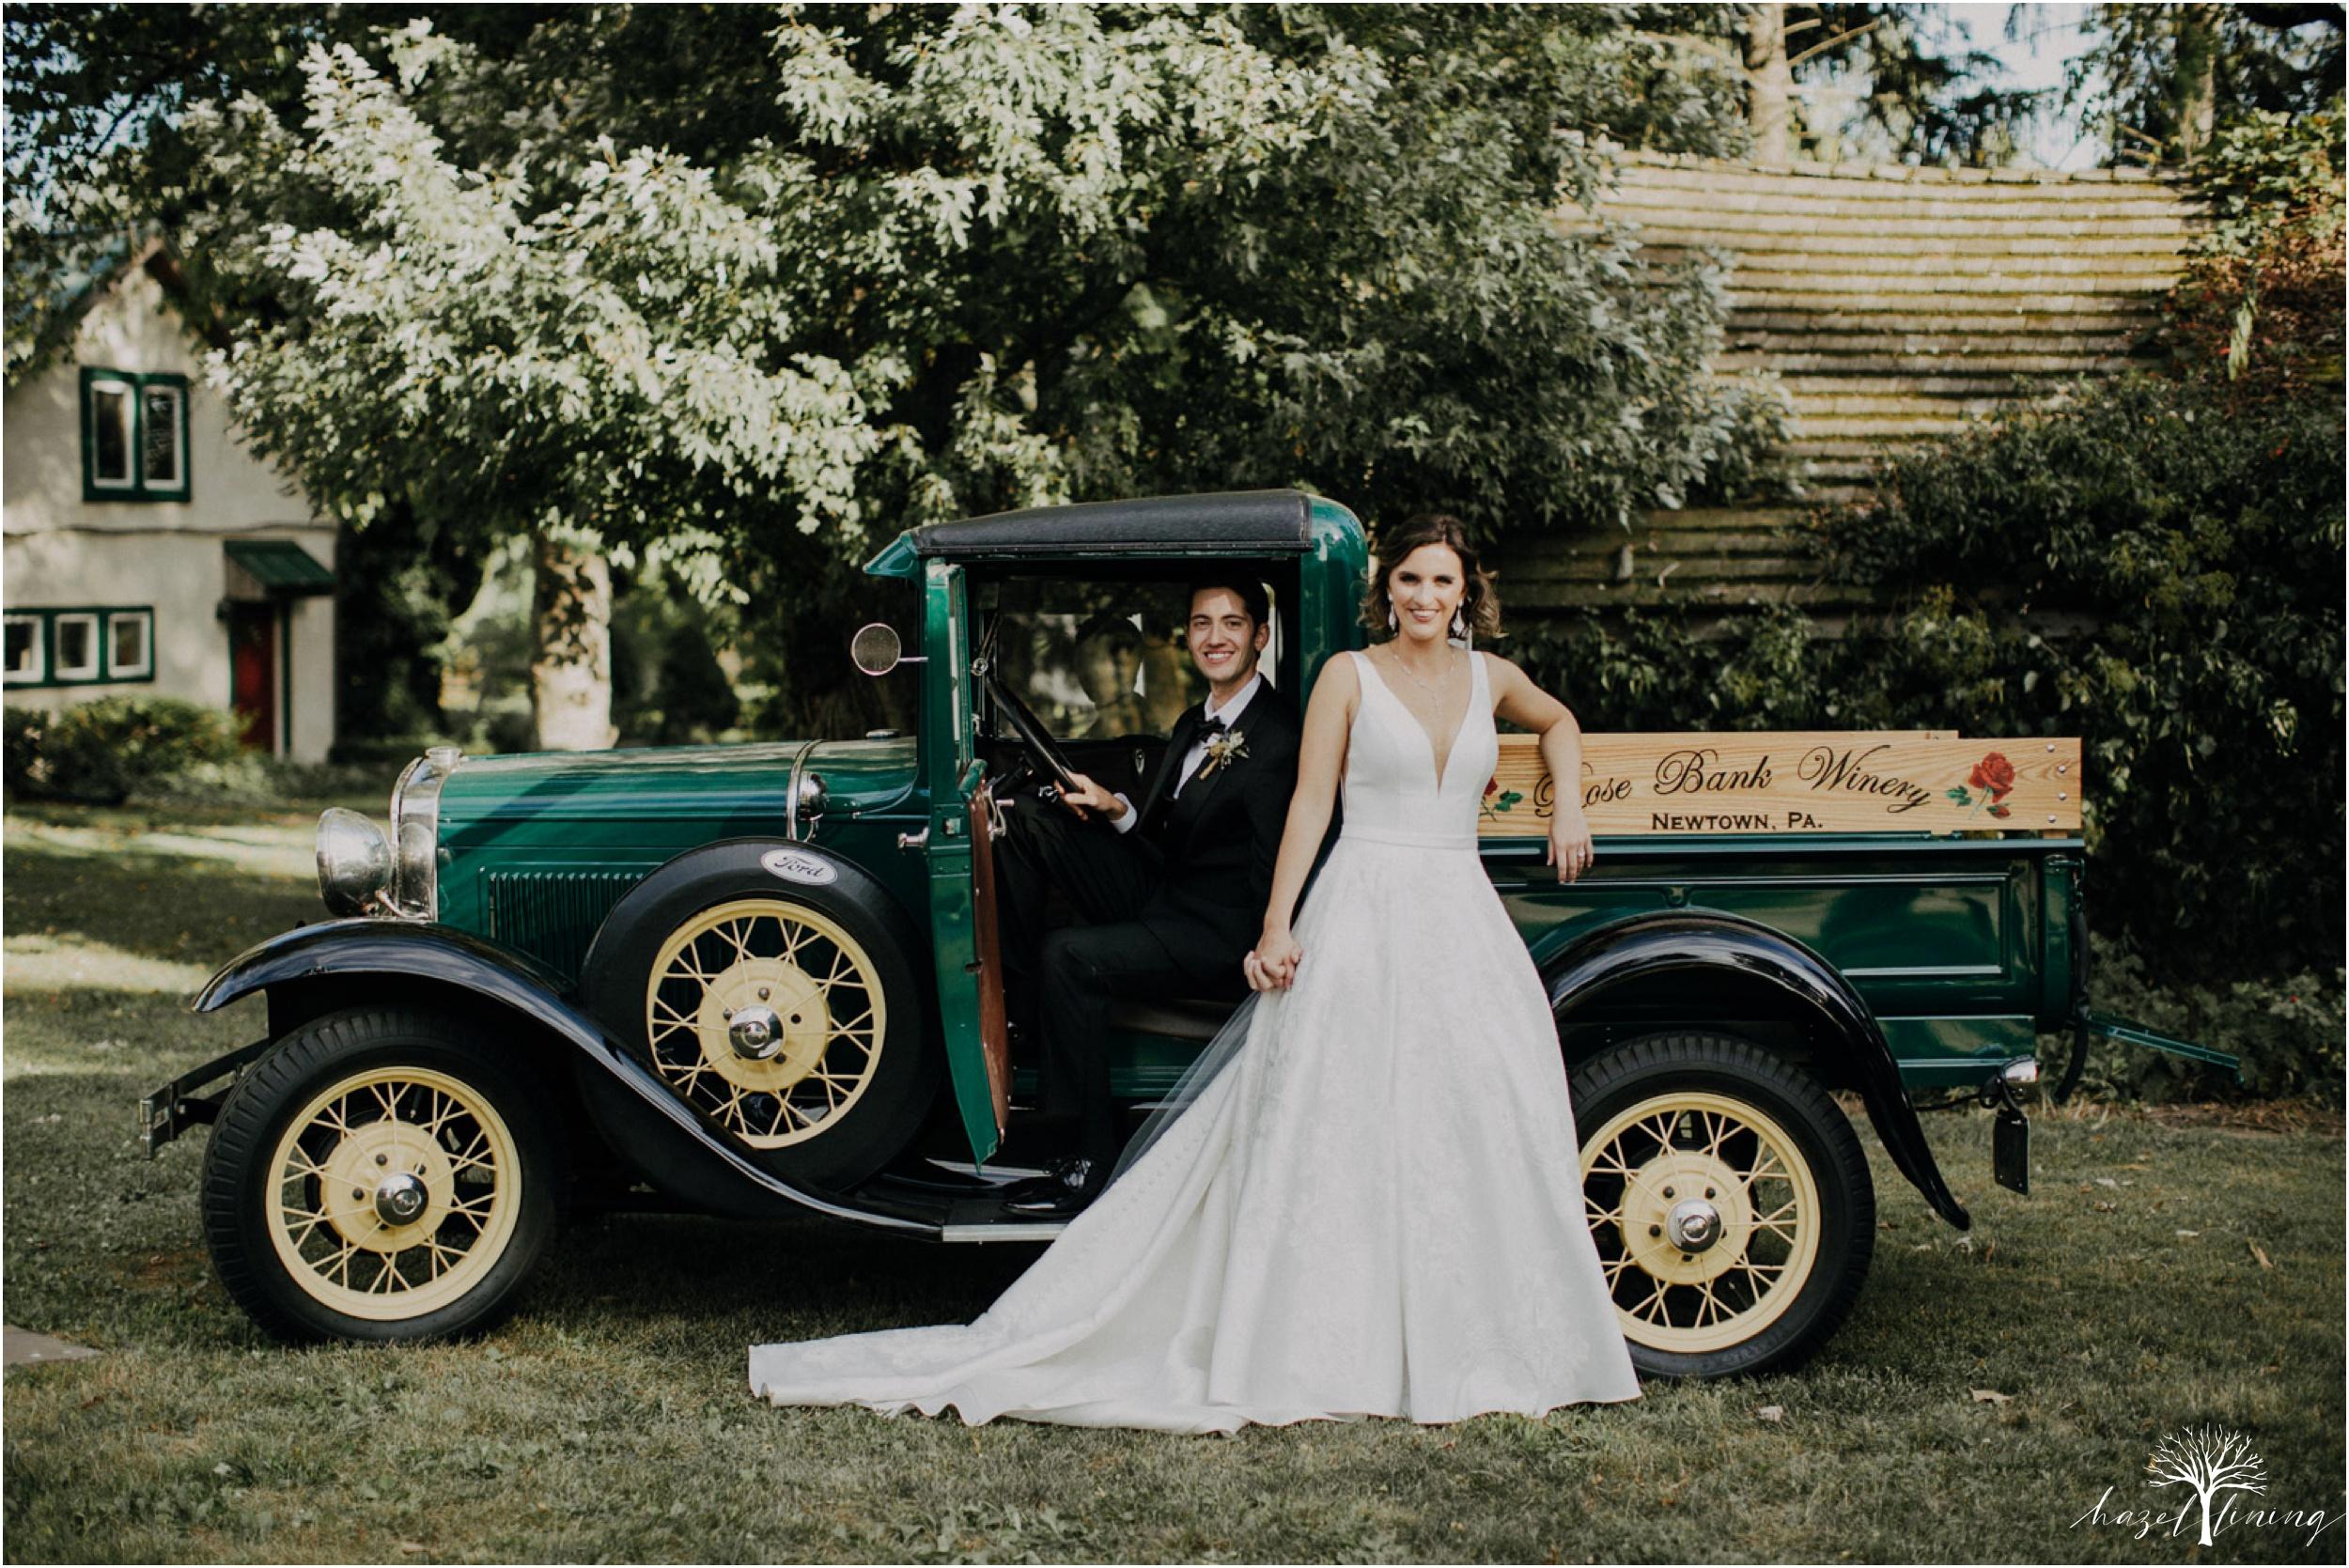 maureen-hepner-anthony-giordano-rose-bank-winery-newtow-pennsylvania-luxury-summer-wedding-hazel-lining-photography-destination-elopement-wedding-engagement-photography_0112.jpg